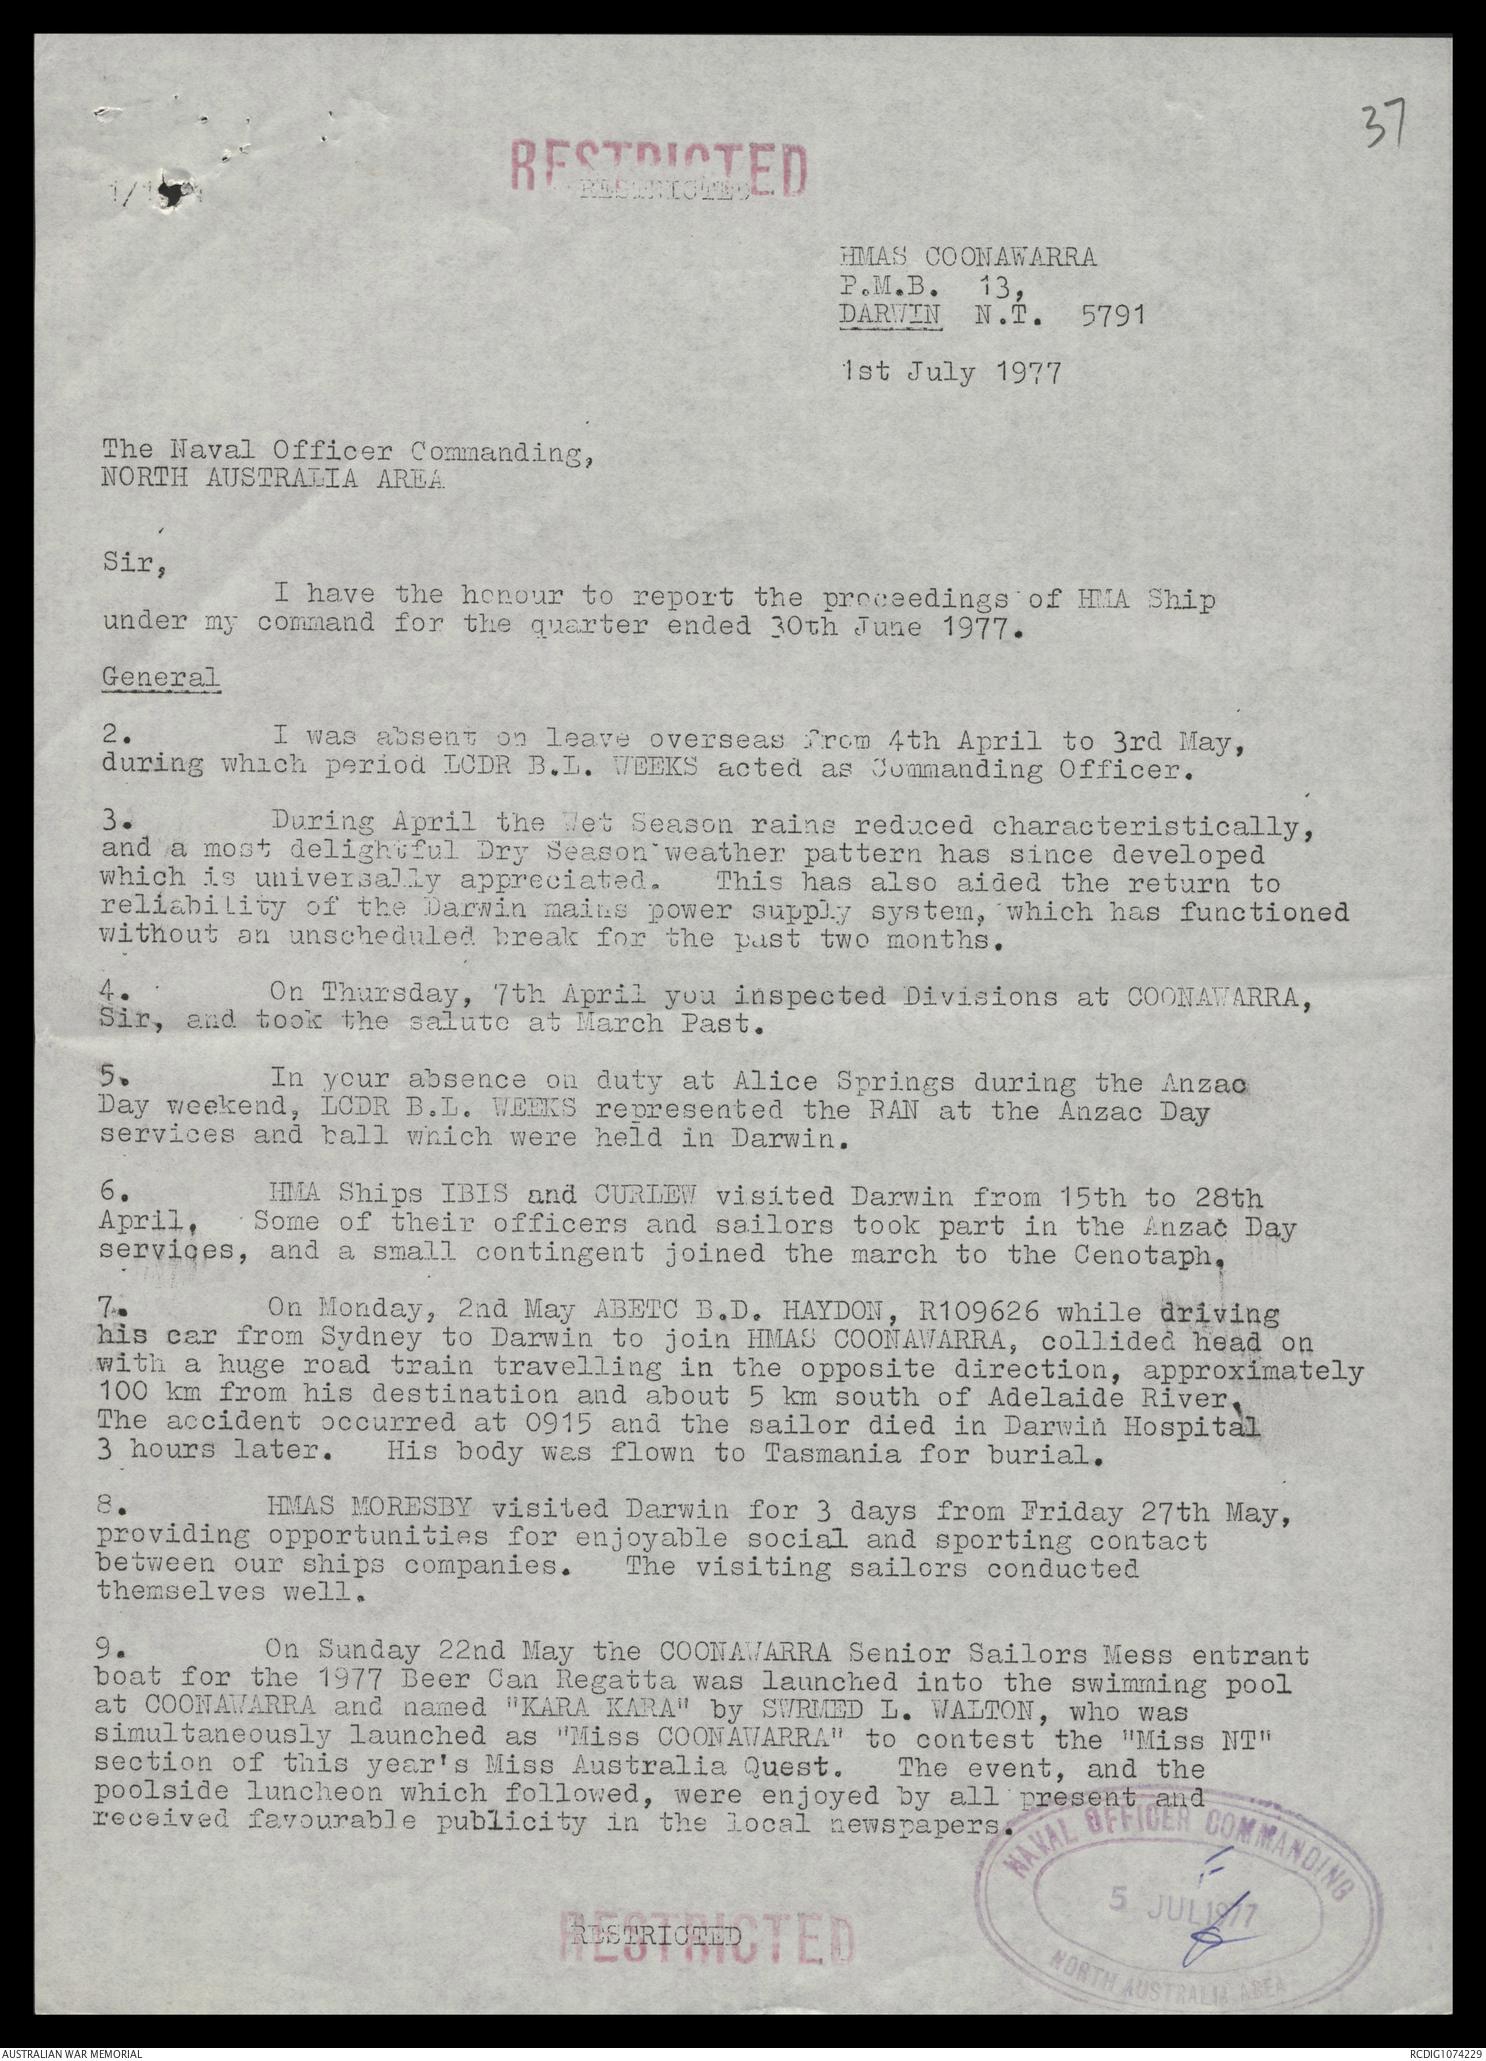 AWM78 432/4 - January-December 1977 | The Australian War